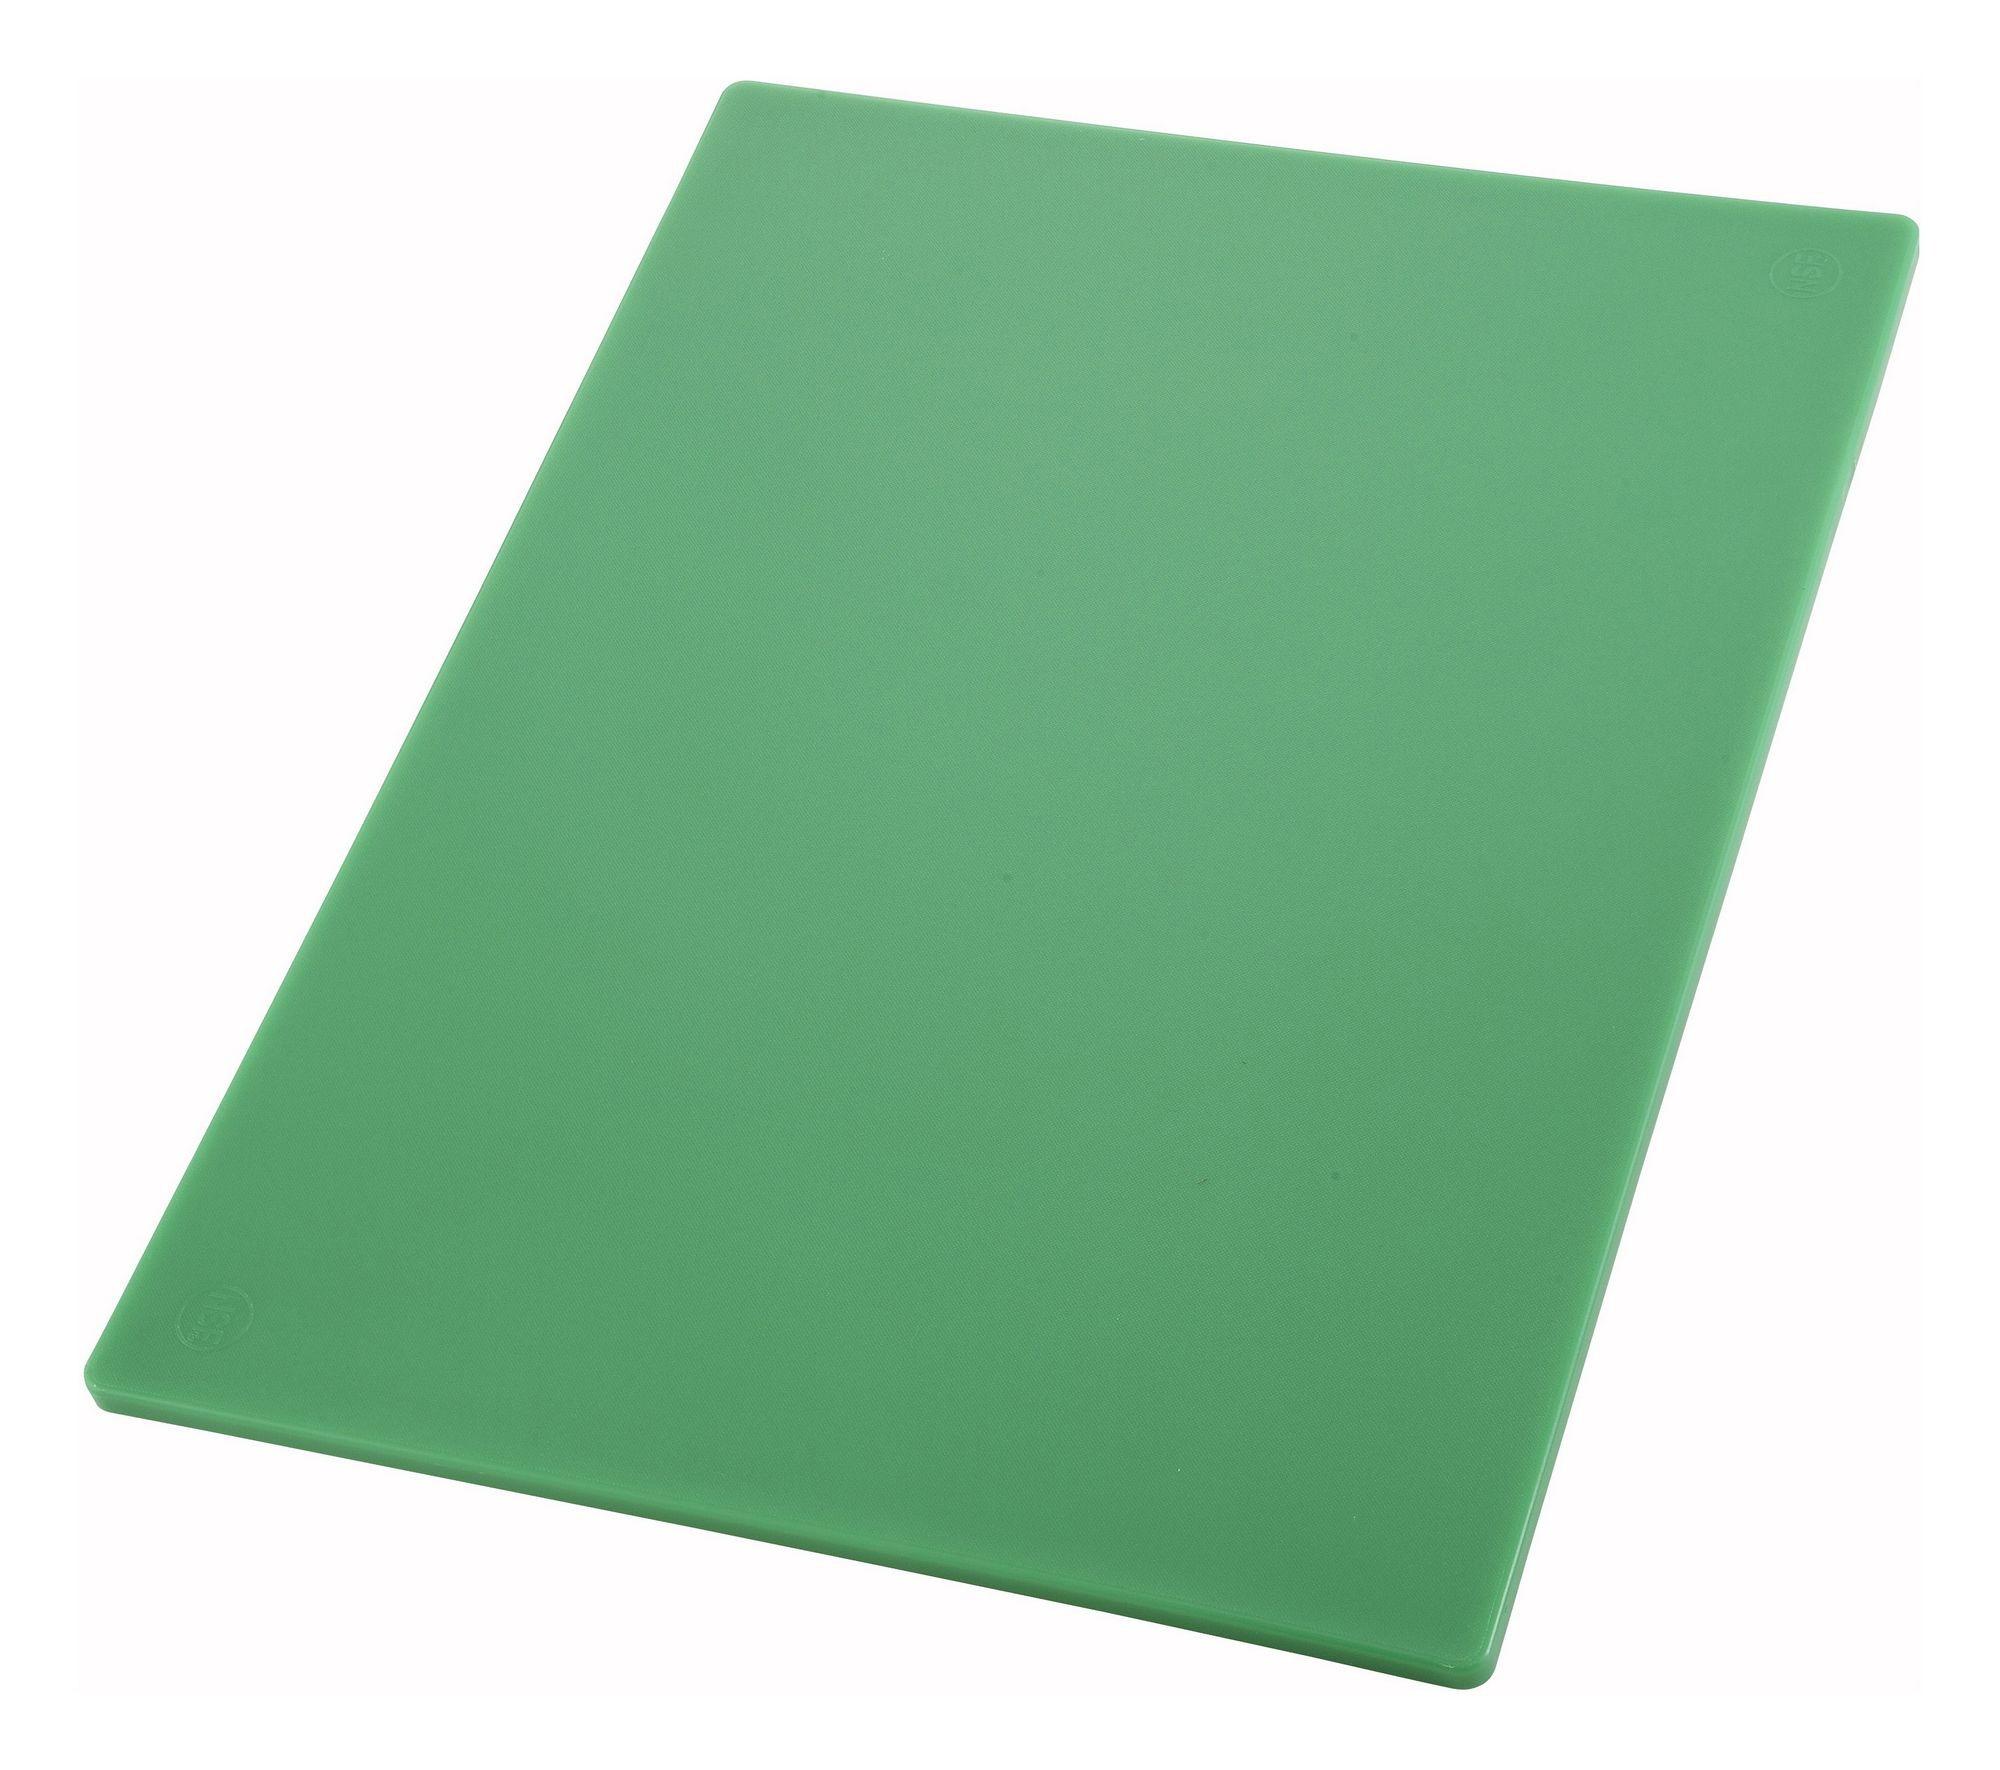 "Winco CBGR-1218 Green Plastic Cutting Board 12"" x 18"" x 1/2"""